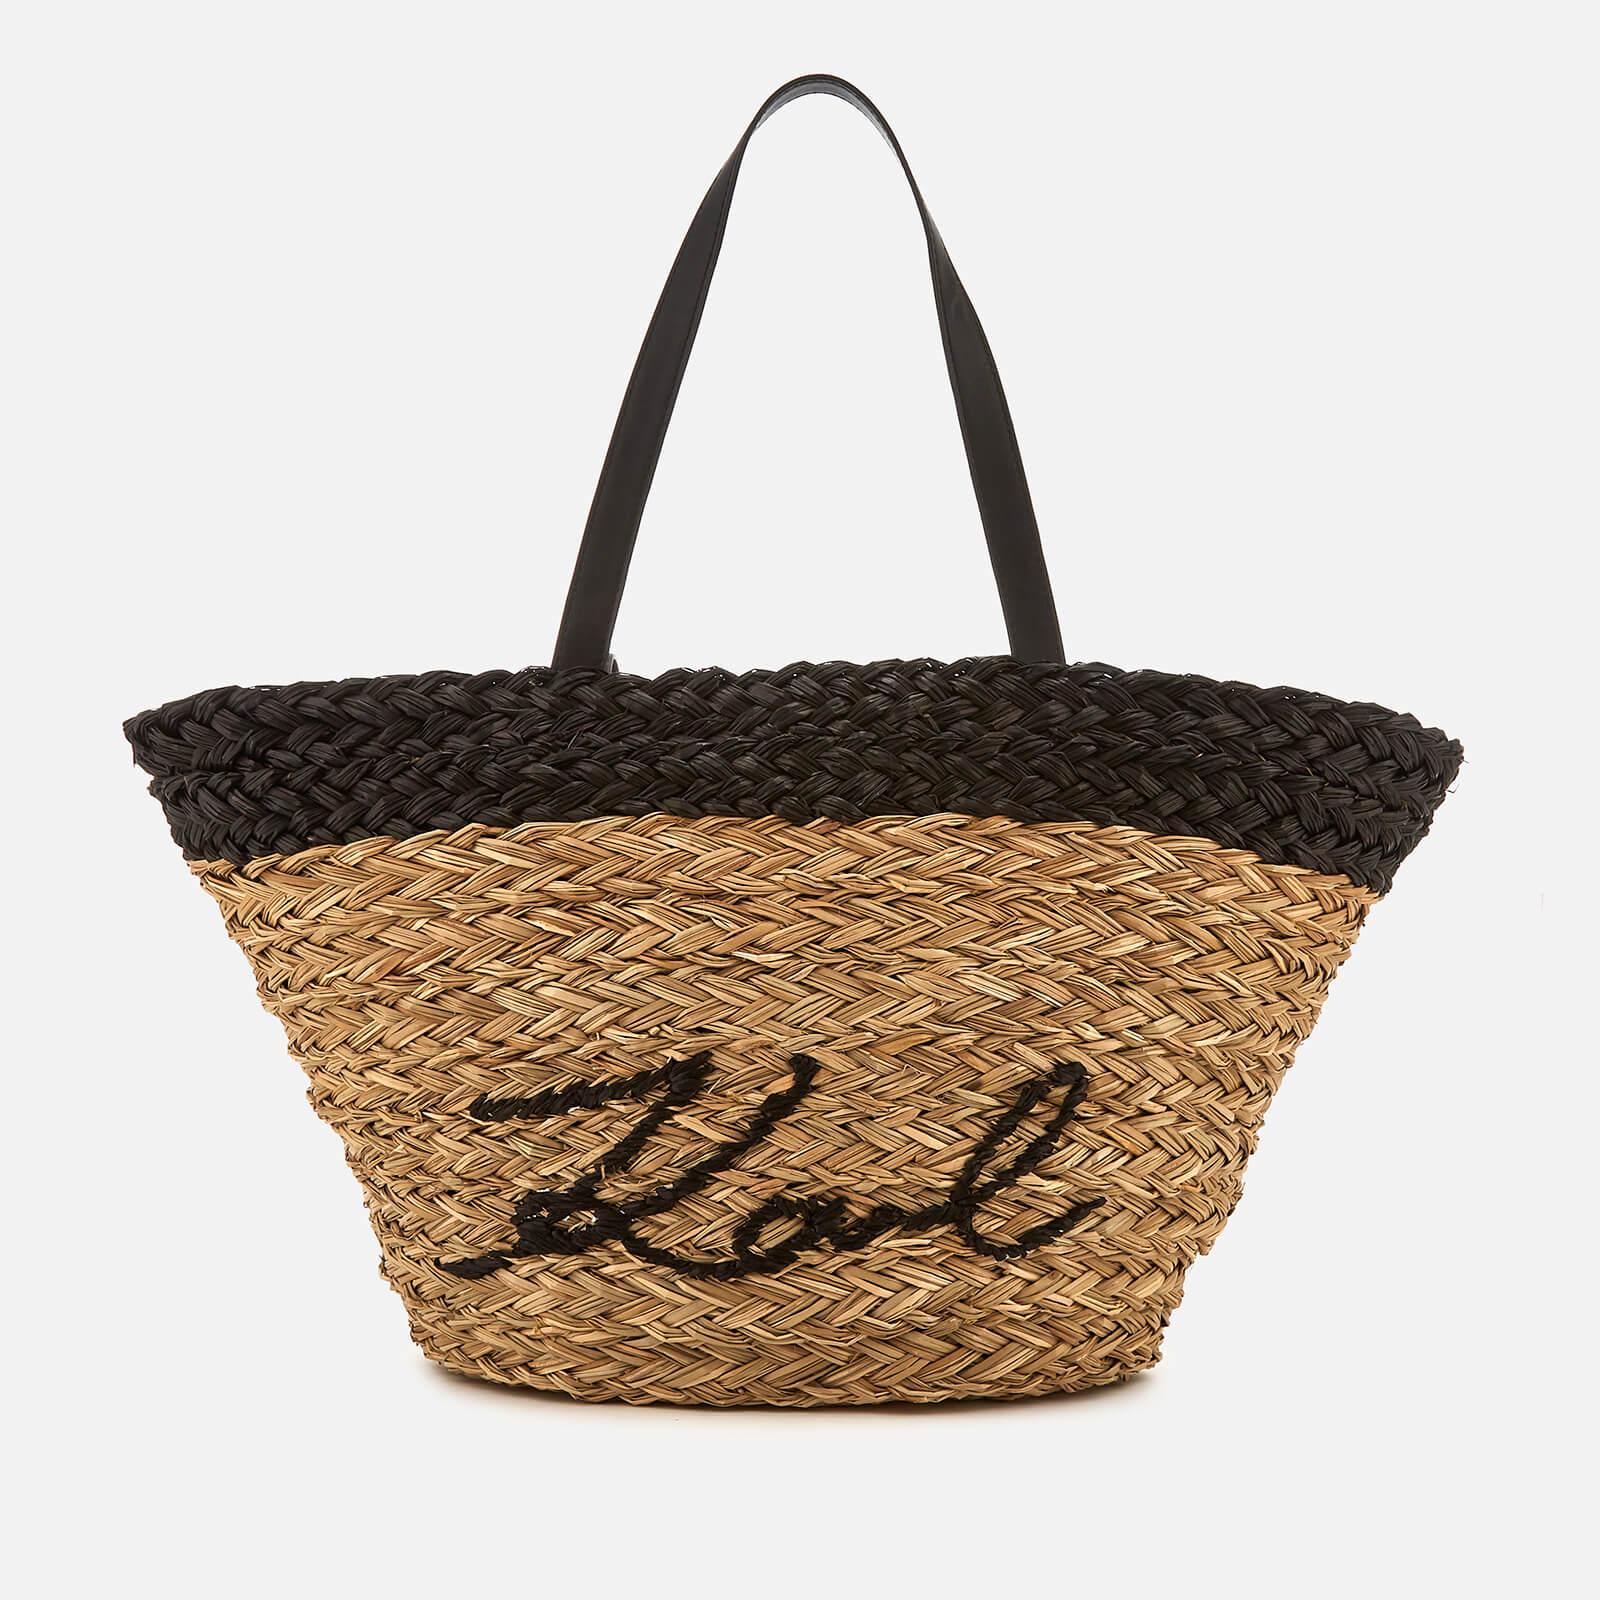 Straw Shopper Bag Natural Women's Kikonik Karl Free Lagerfeld rxthQsdBC